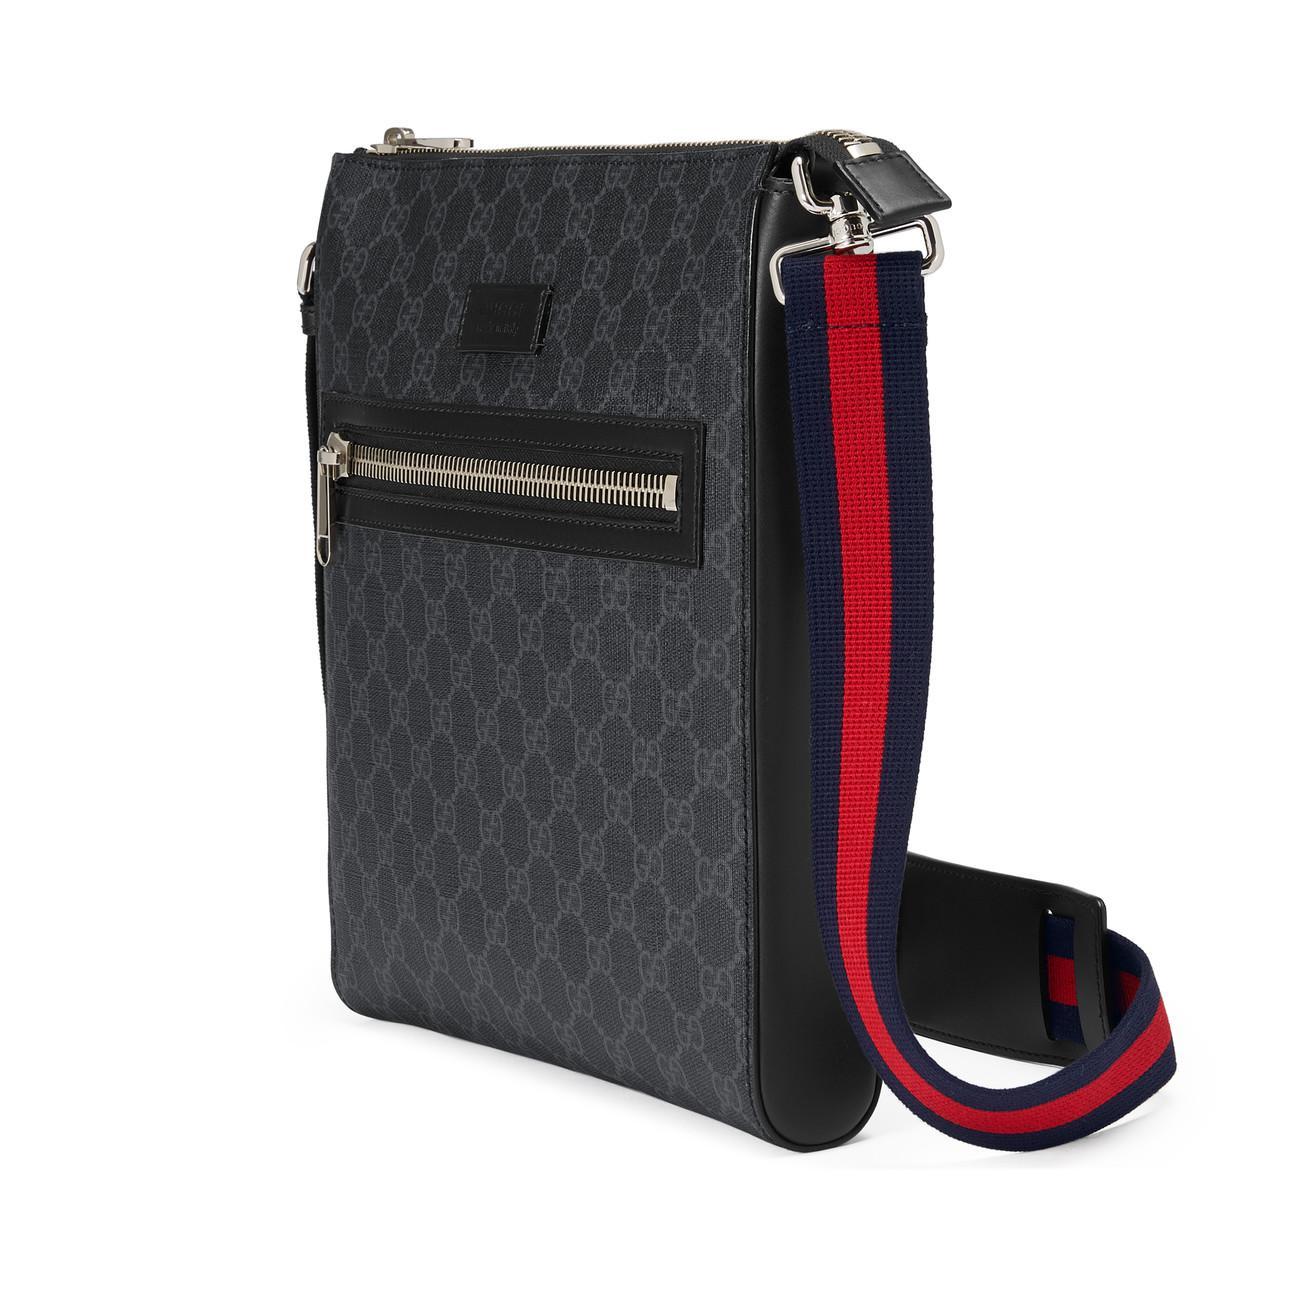 1807ed5ea13c Lyst - Gucci GG Supreme Messenger in Blue for Men